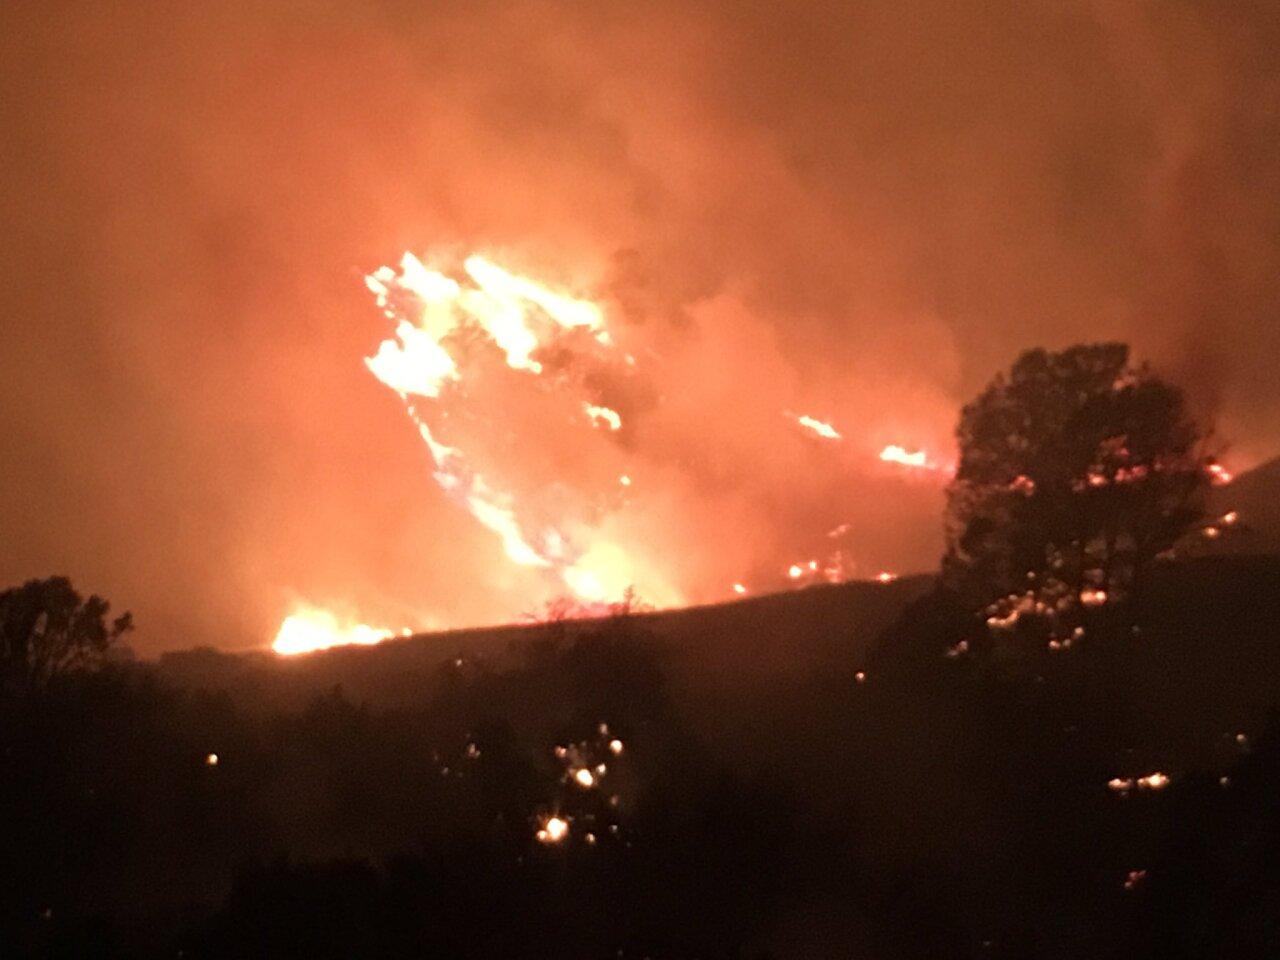 Range Fire Sunday night in Santa Ynez Valley. Photo Courtesy: Santa Barbara County Fire Department